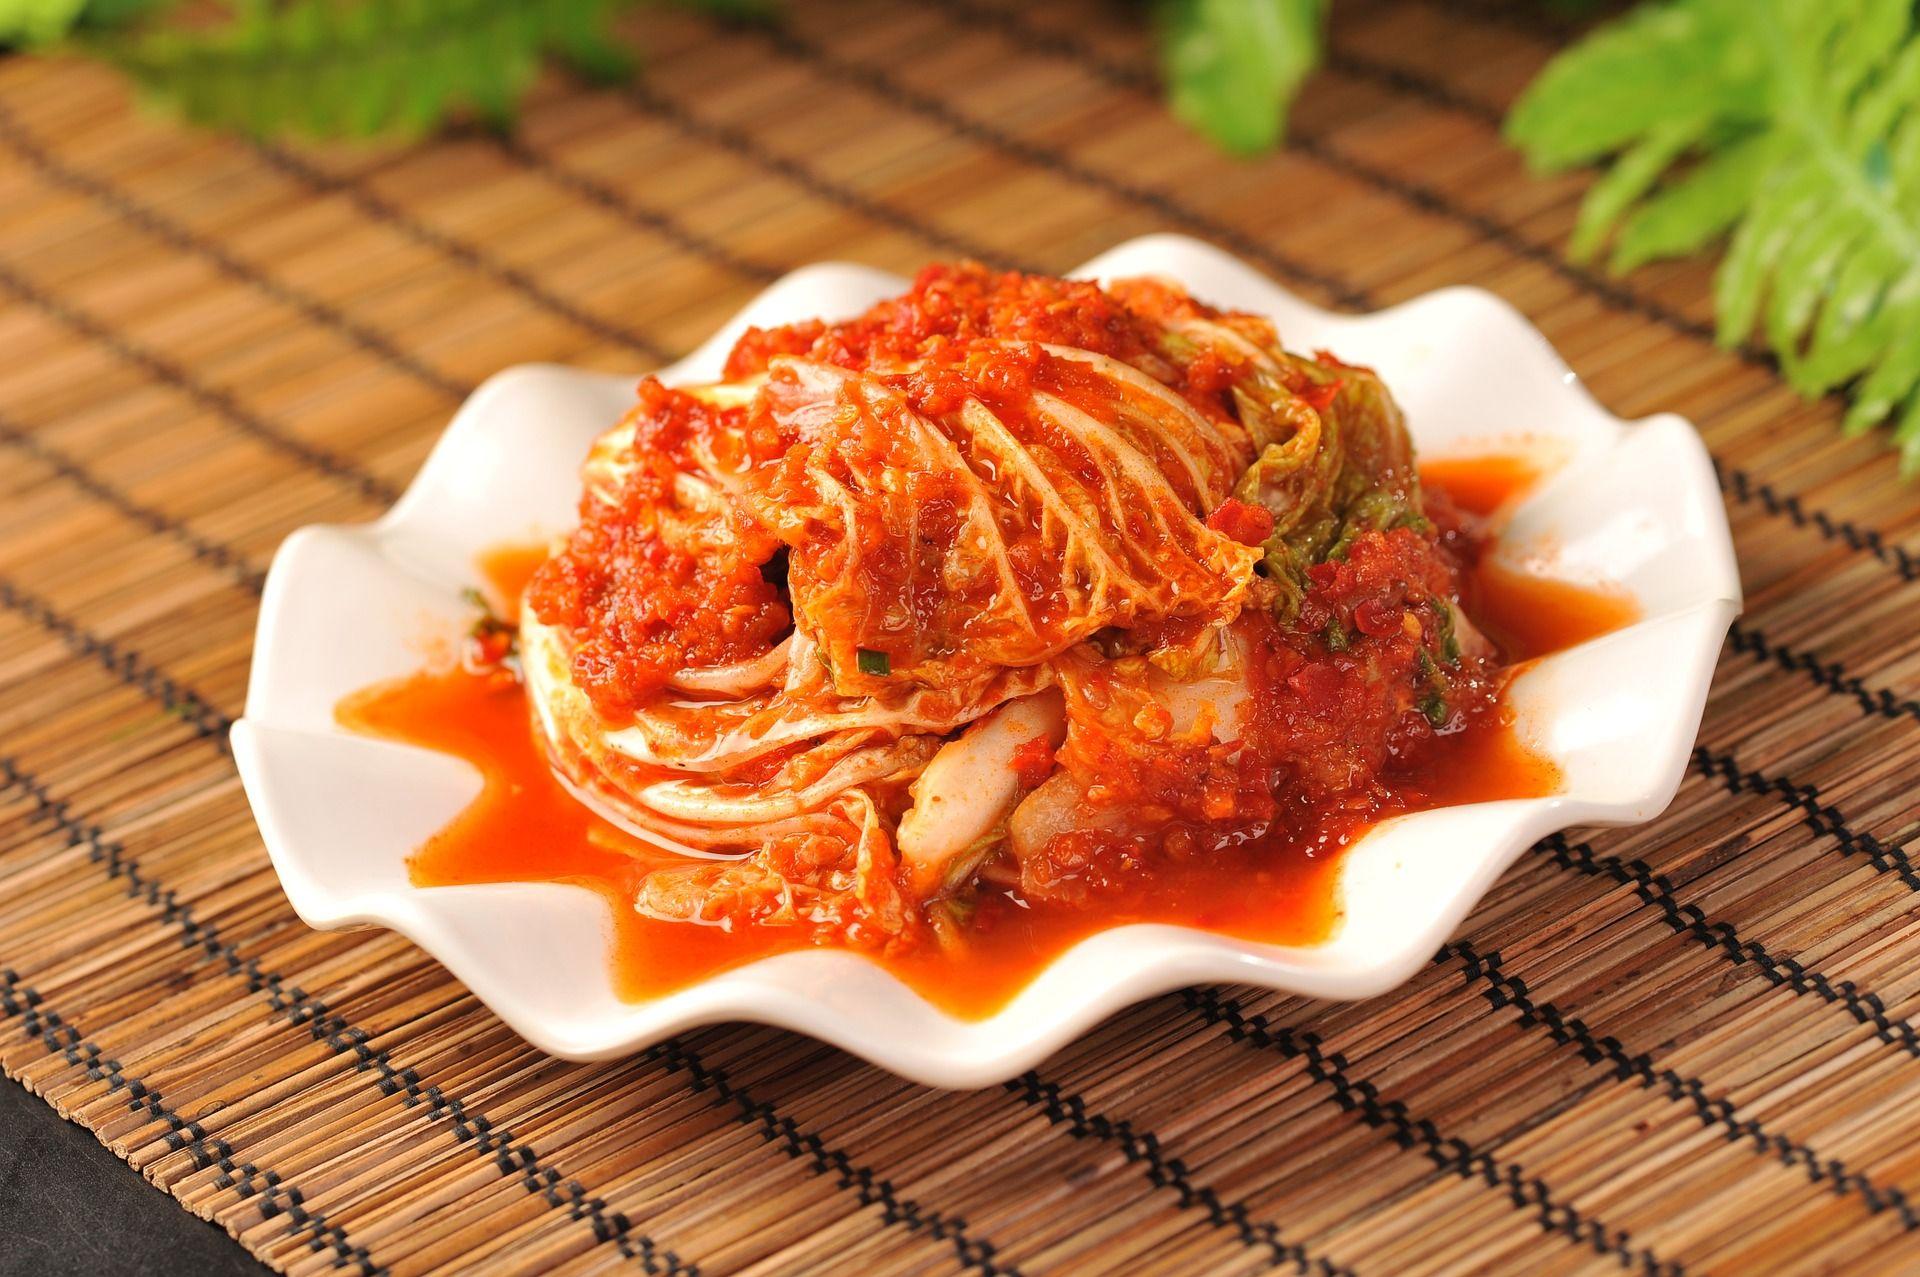 Korean Food 10 Best Tasting Dishes From South Korea In 2020 Korean Food Food Kimchi